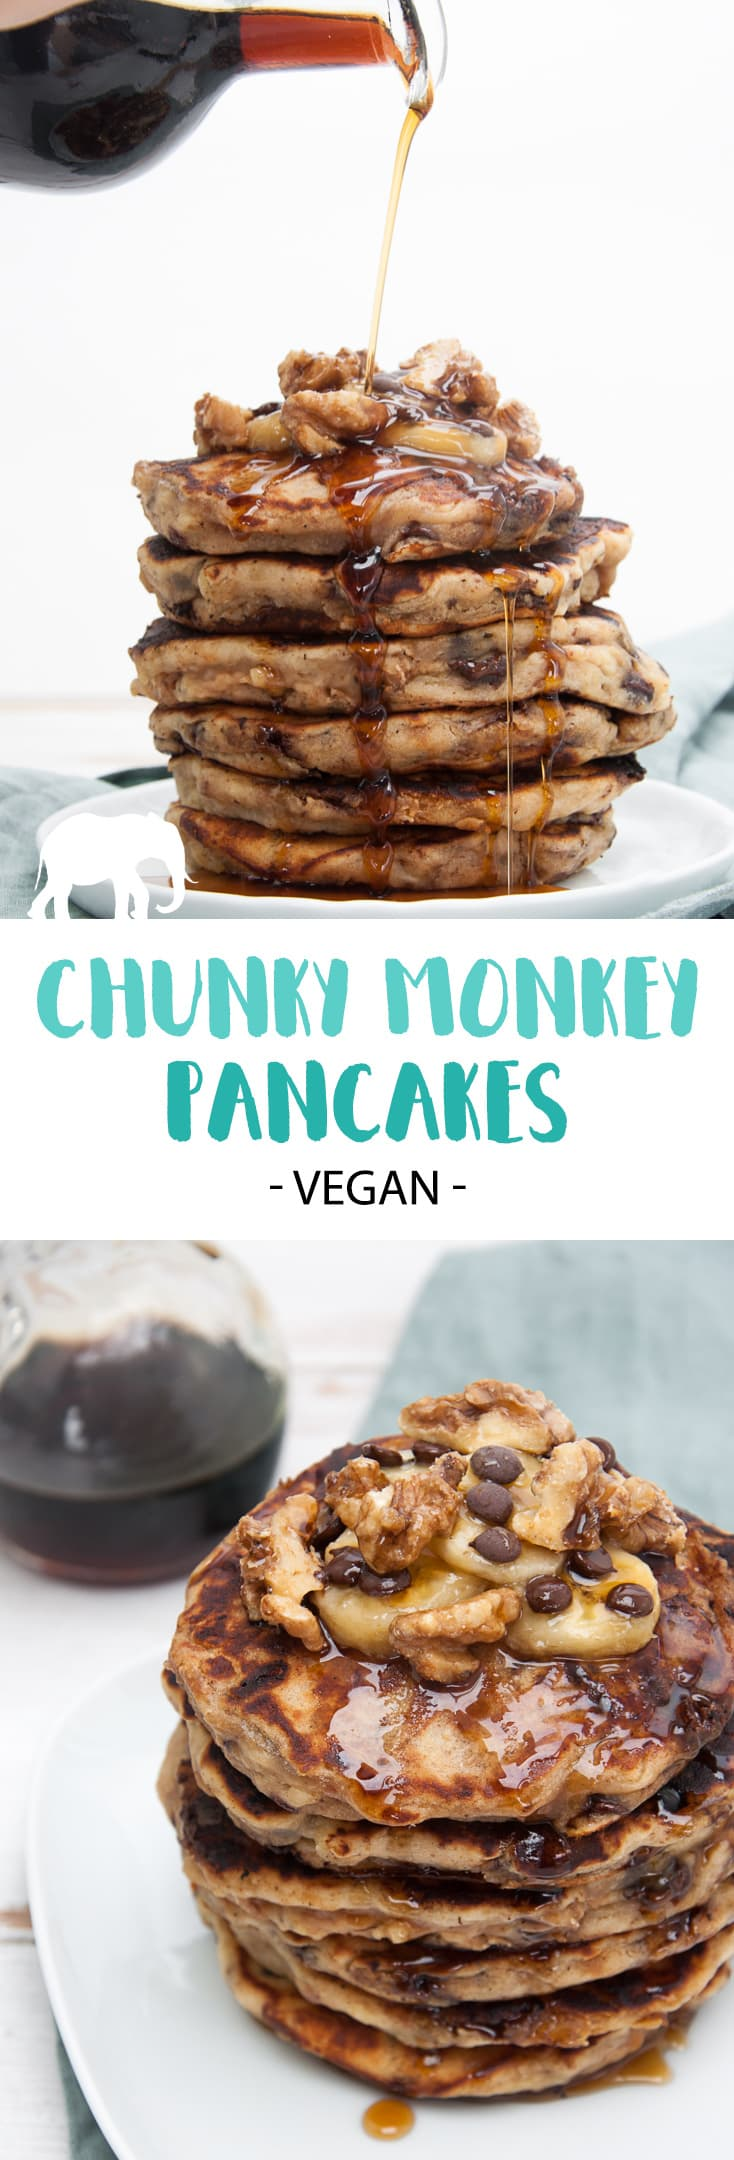 Vegan Chunky Monkey Pancakes with banana, chocolate, peanut butter, and walnuts | ElephantasticVegan.com #vegan #pancakes #chunkymonkey #banana #chocolate #peanutbutter #walnuts